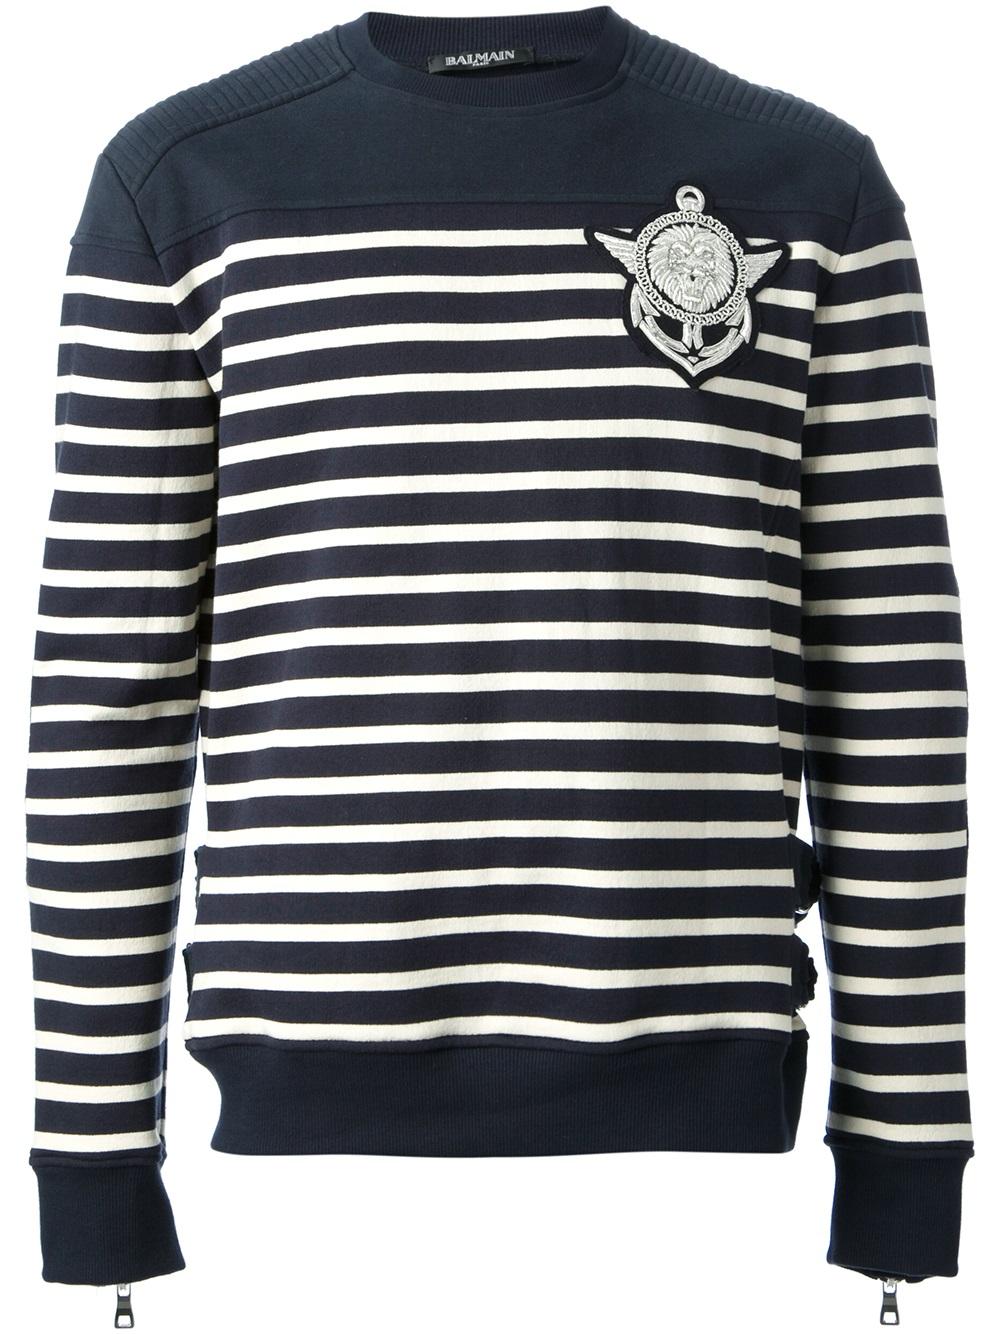 Balmain-sweater-one